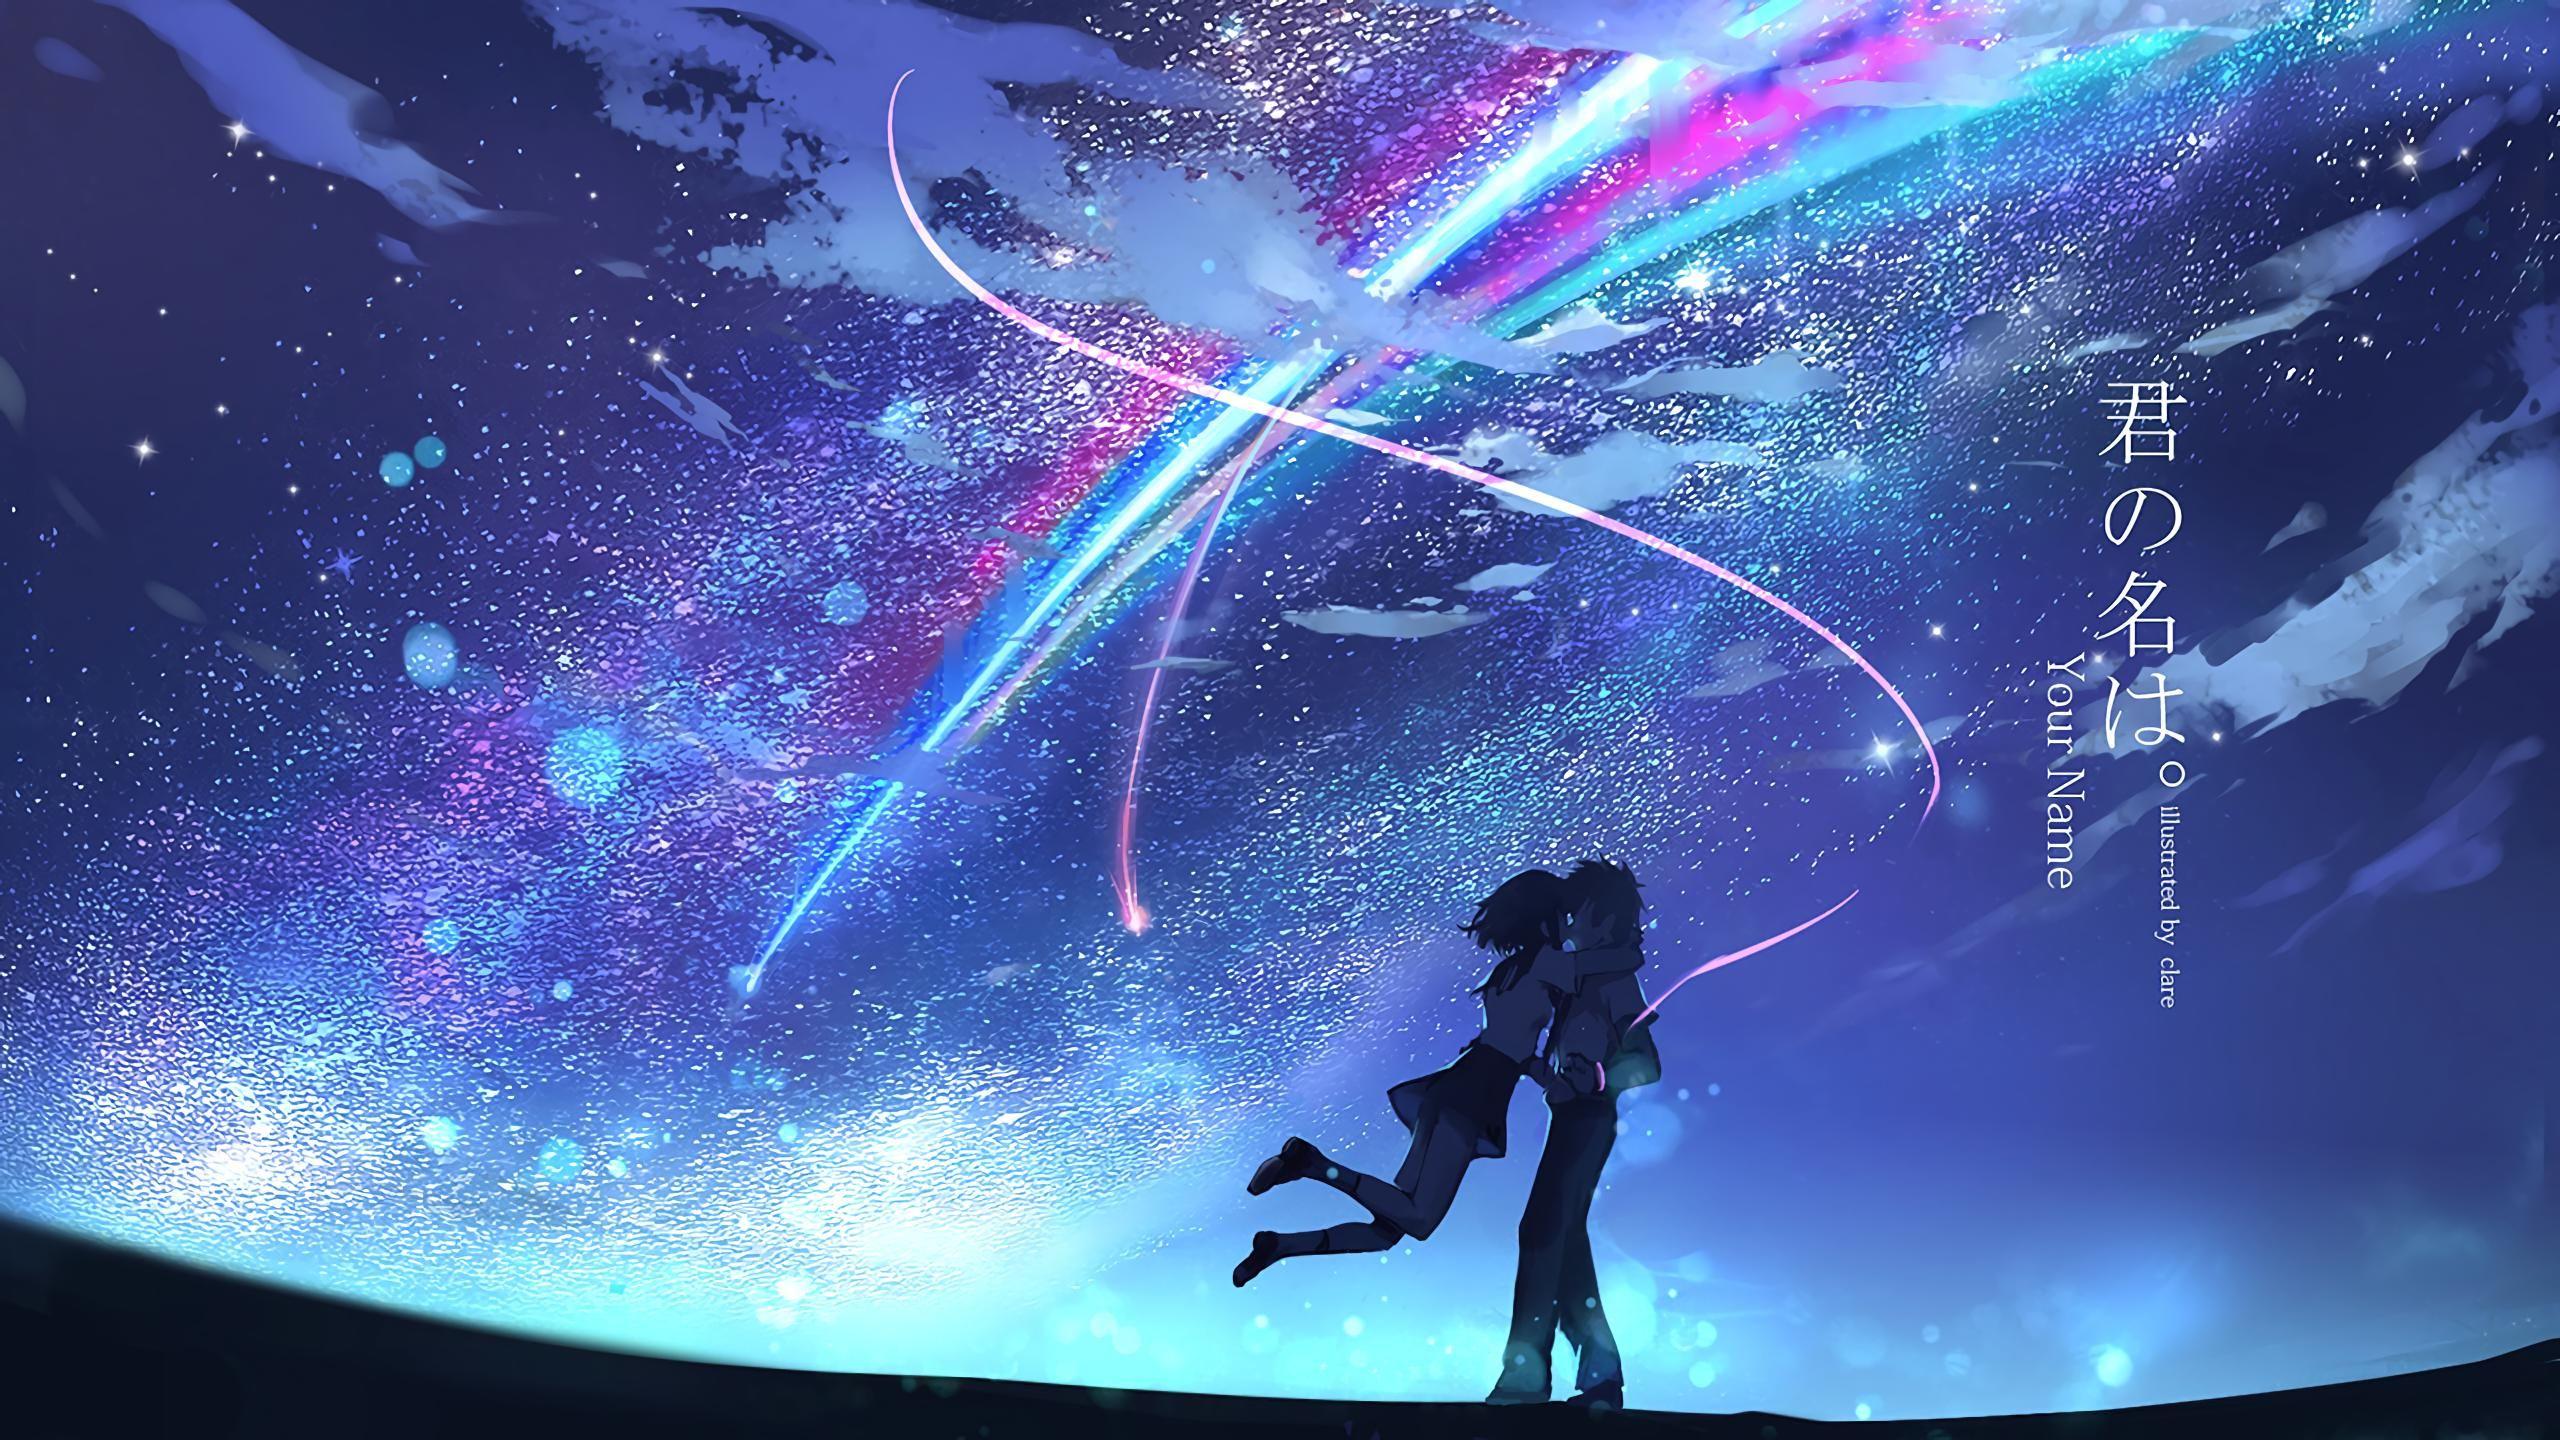 Your Name Kimi no na wa wallpaper Your name anime Name wallpaper 2560x1440